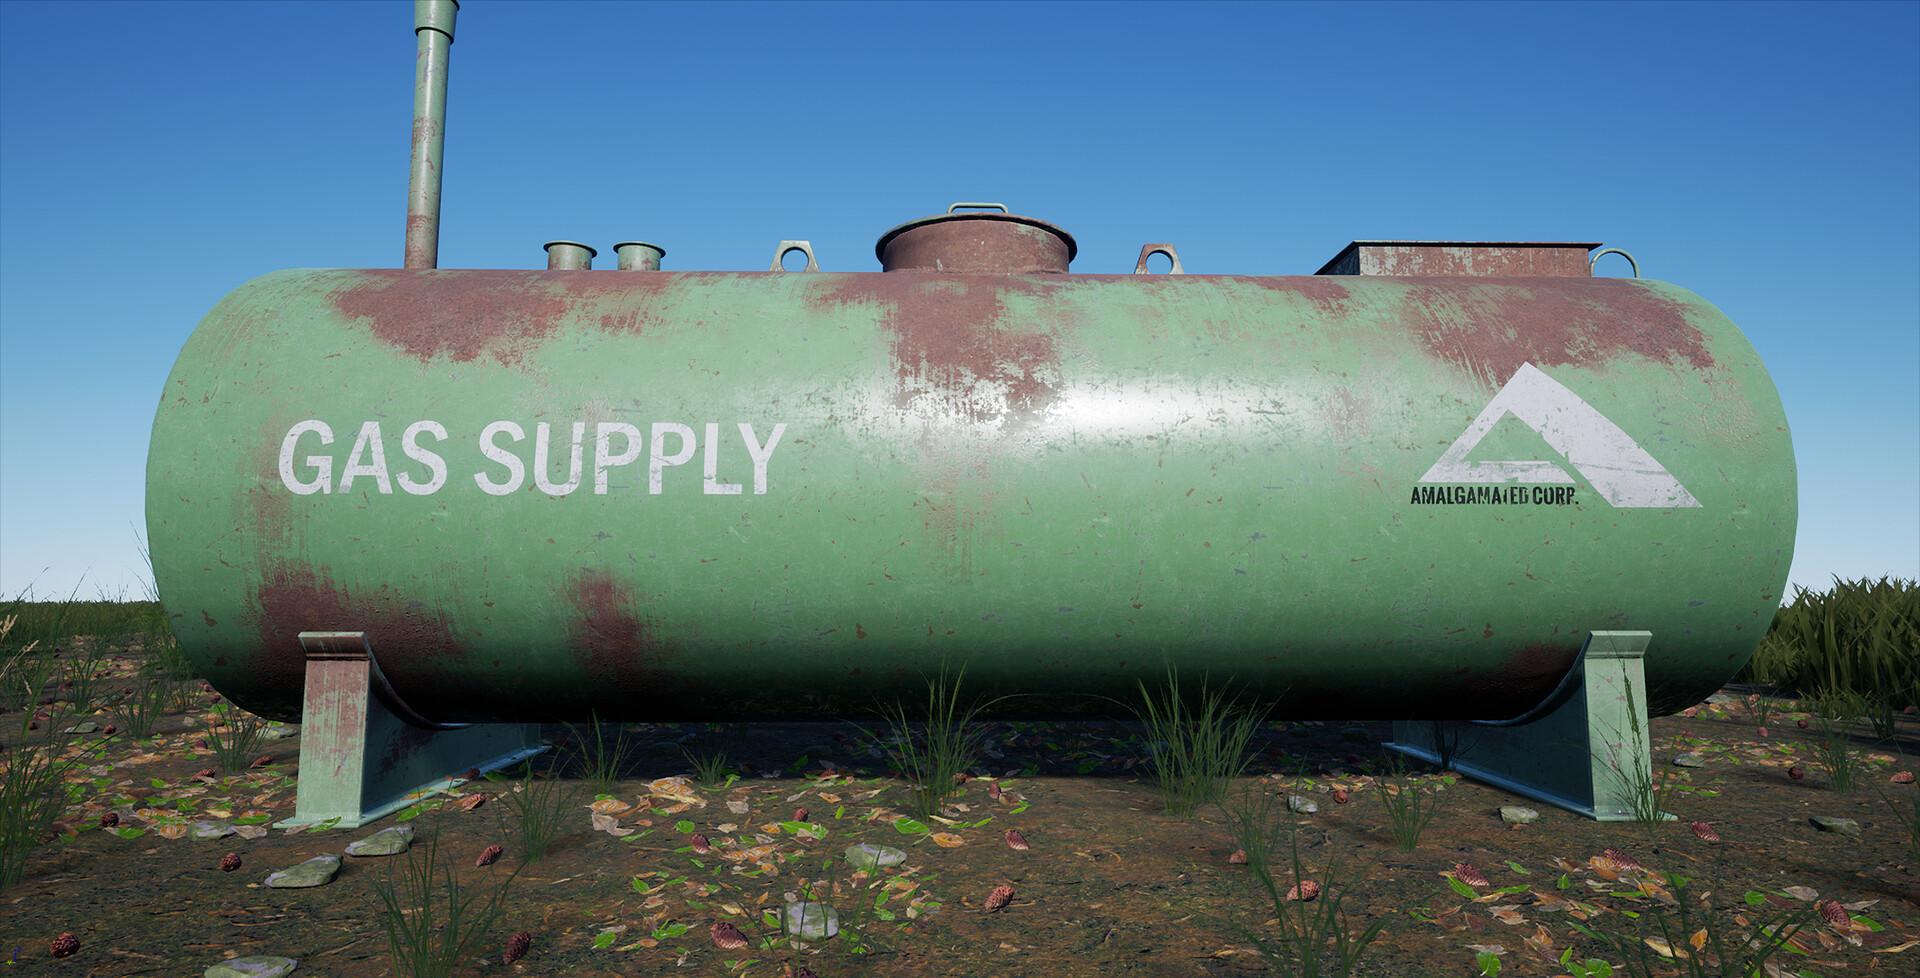 Carl kent gas tanker 2